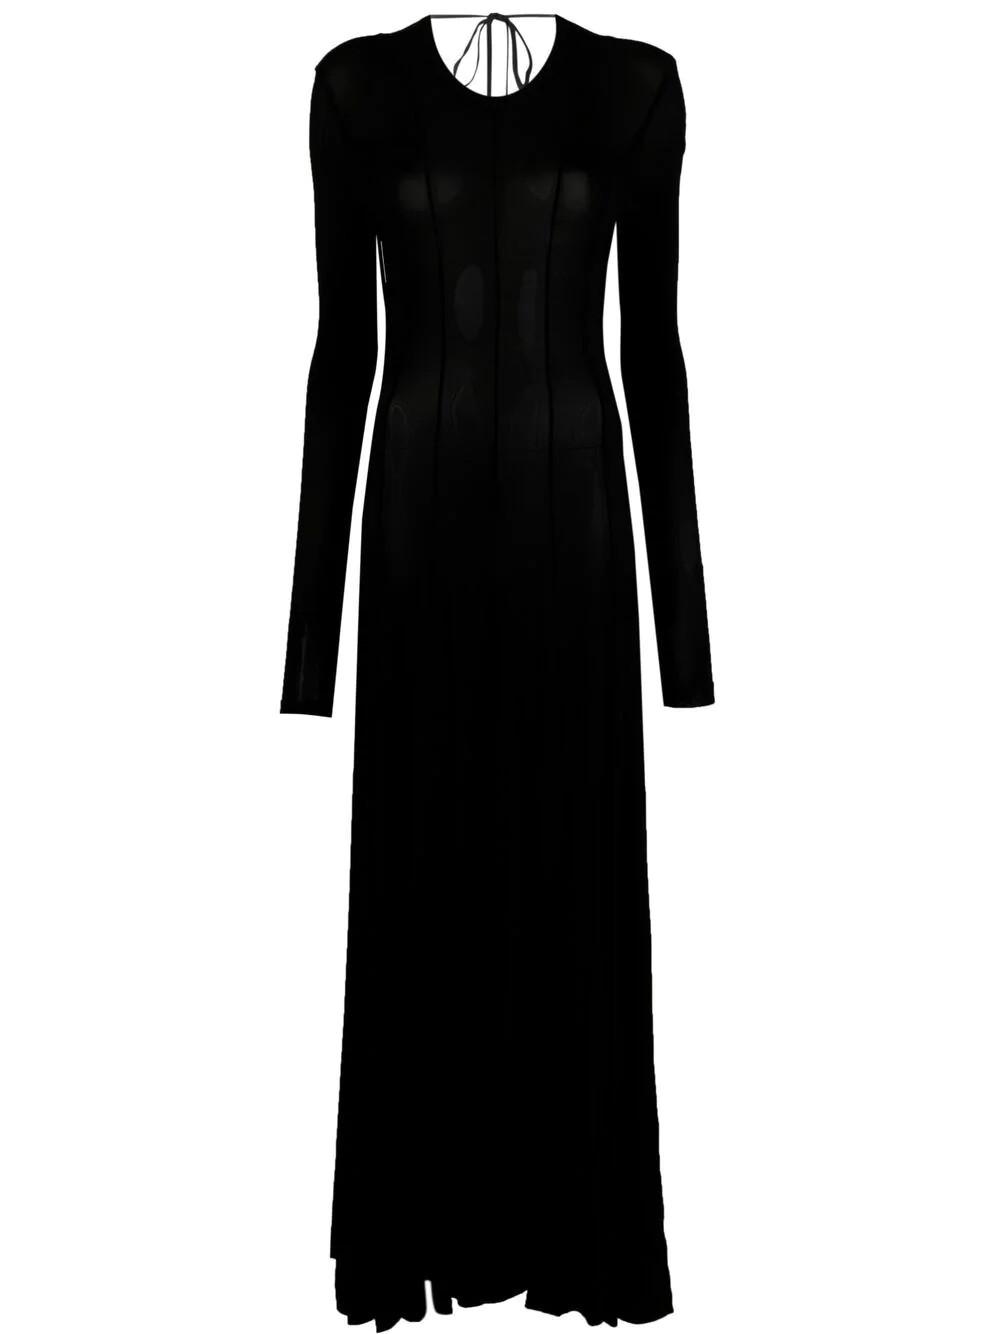 OPEN BACK SQUID DRESS